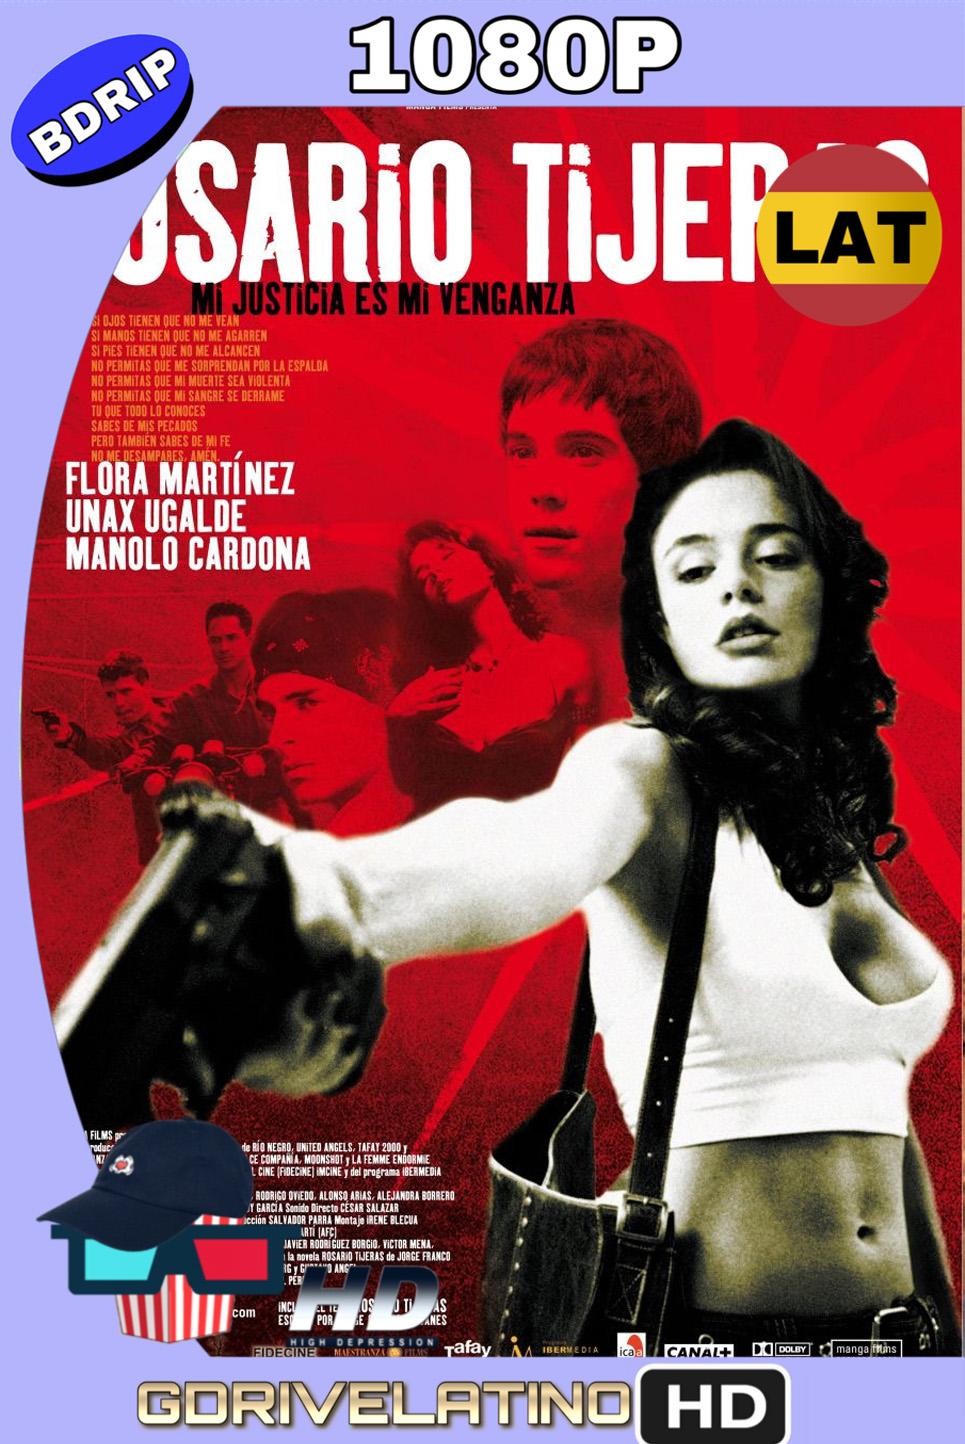 Rosario Tijeras (2005) BDRIP 1080p Latino MKV